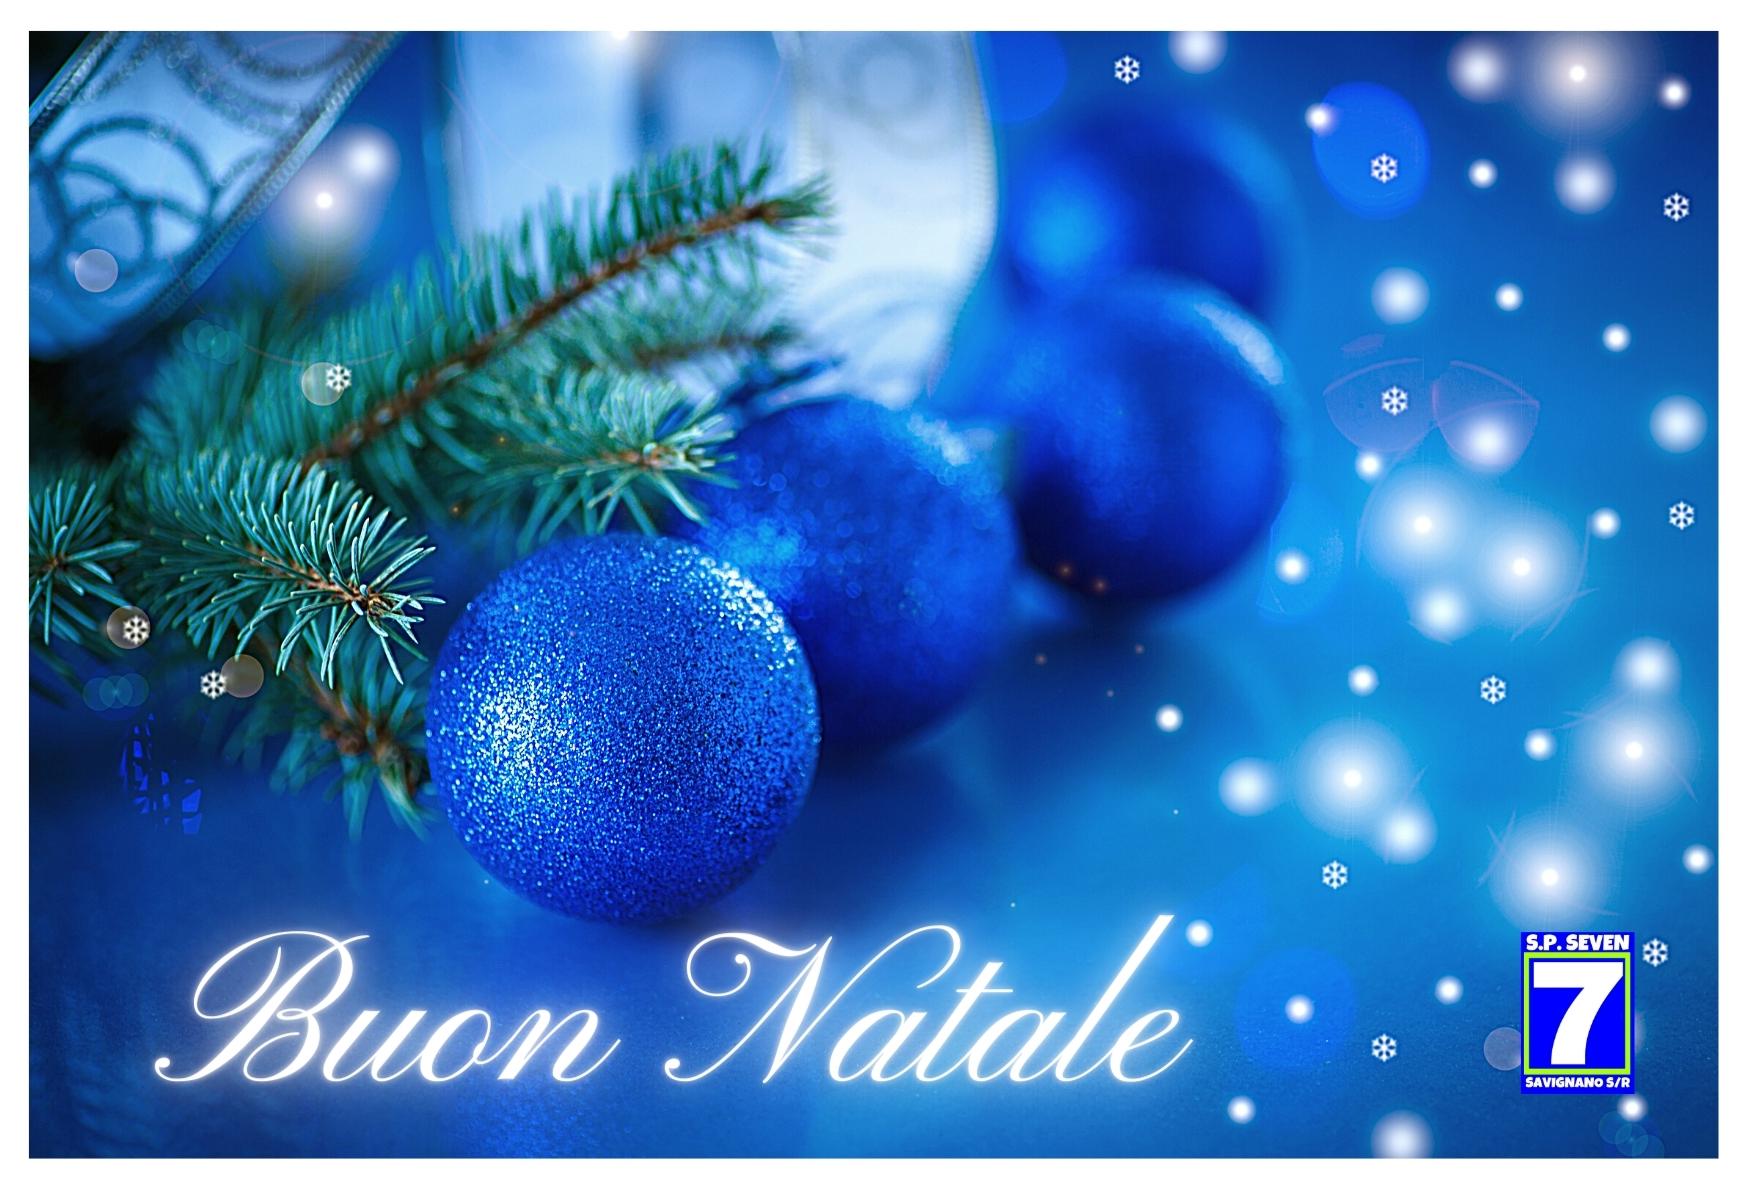 Buon Natalejpg